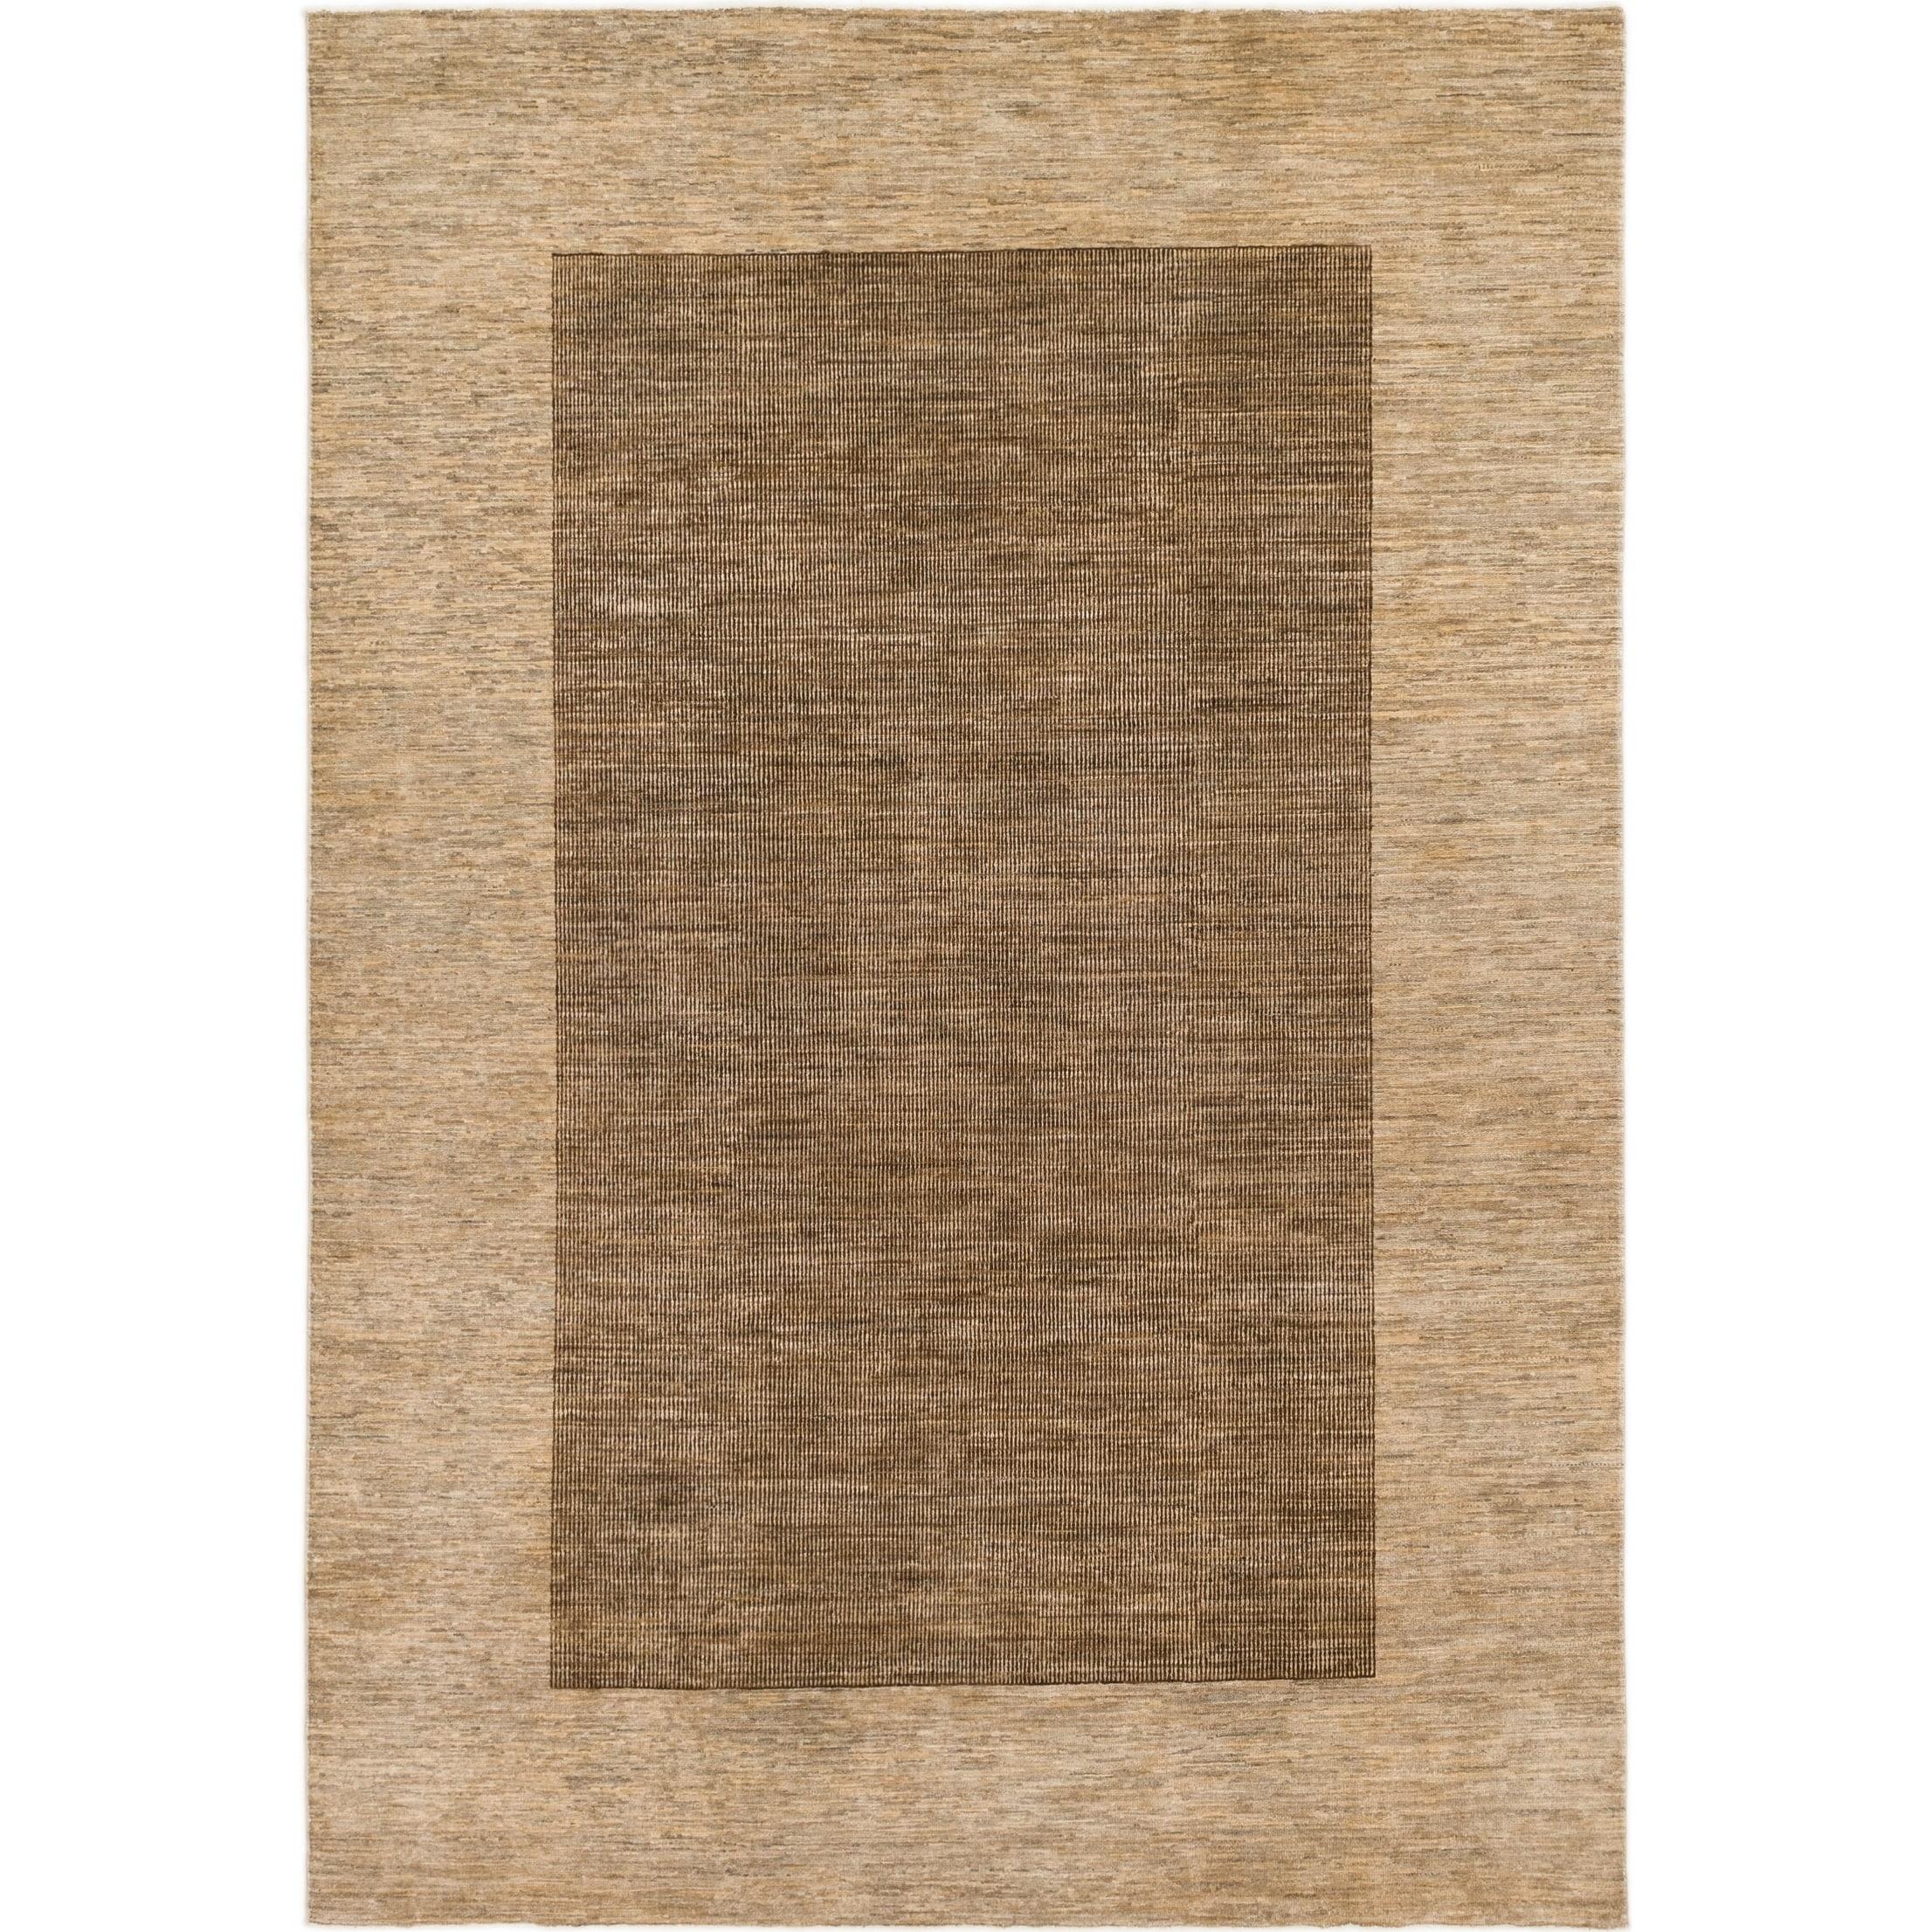 Hand Knotted Kashkuli Gabbeh Wool Area Rug - 6 5 x 9 6 (Brown - 6 5 x 9 6)